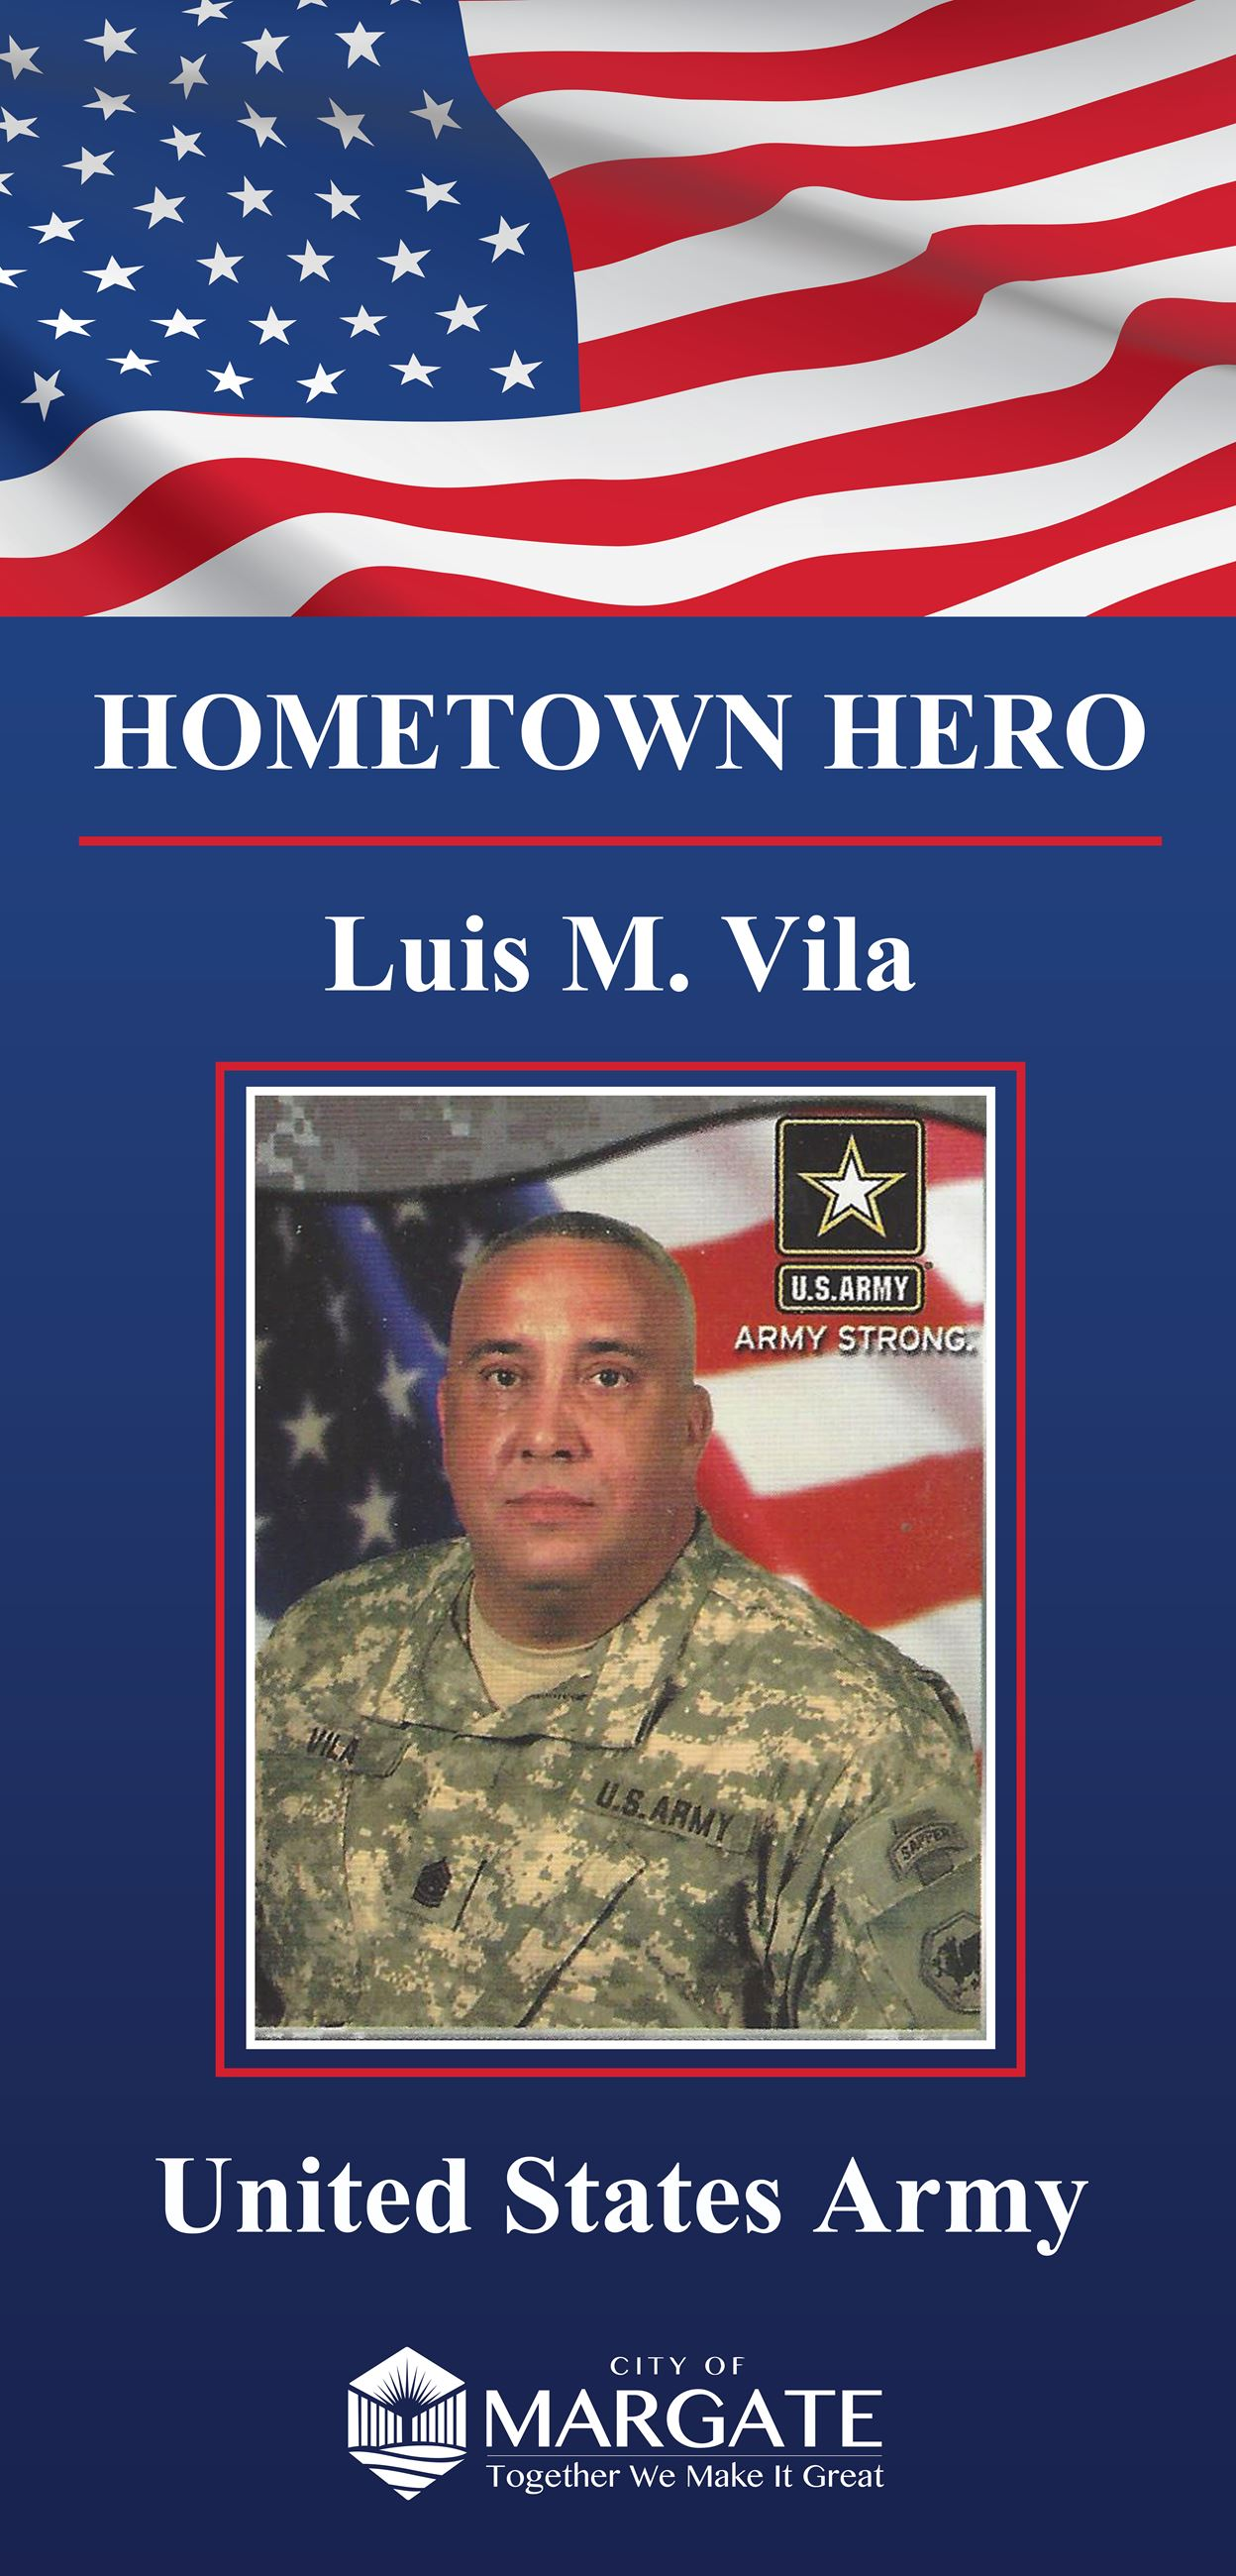 Luis M. Vila